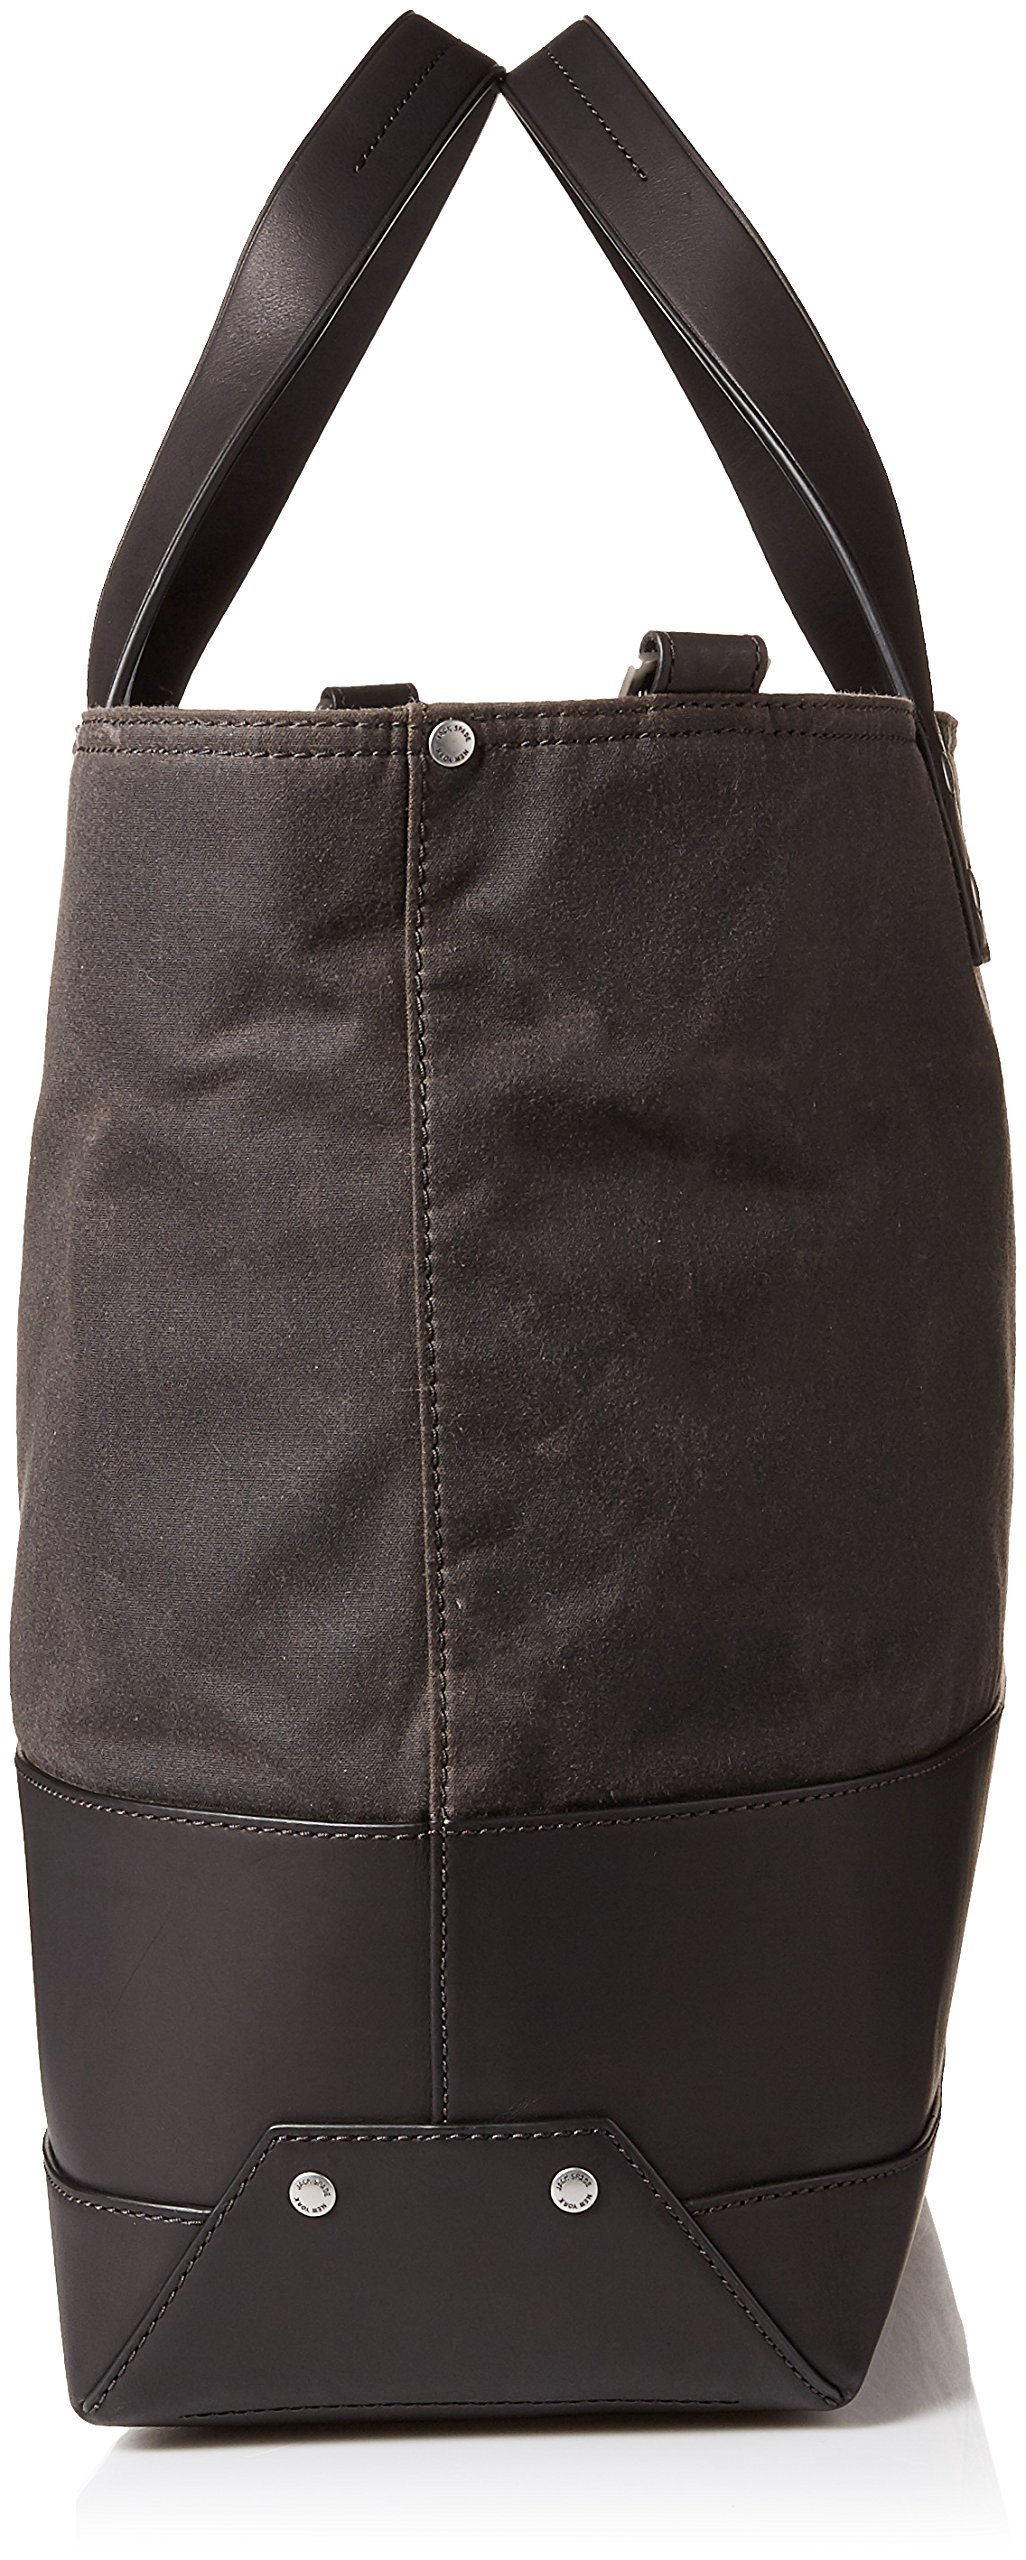 Jack Spade Men's Waxwear Coal Bag by Jack Spade (Image #3)